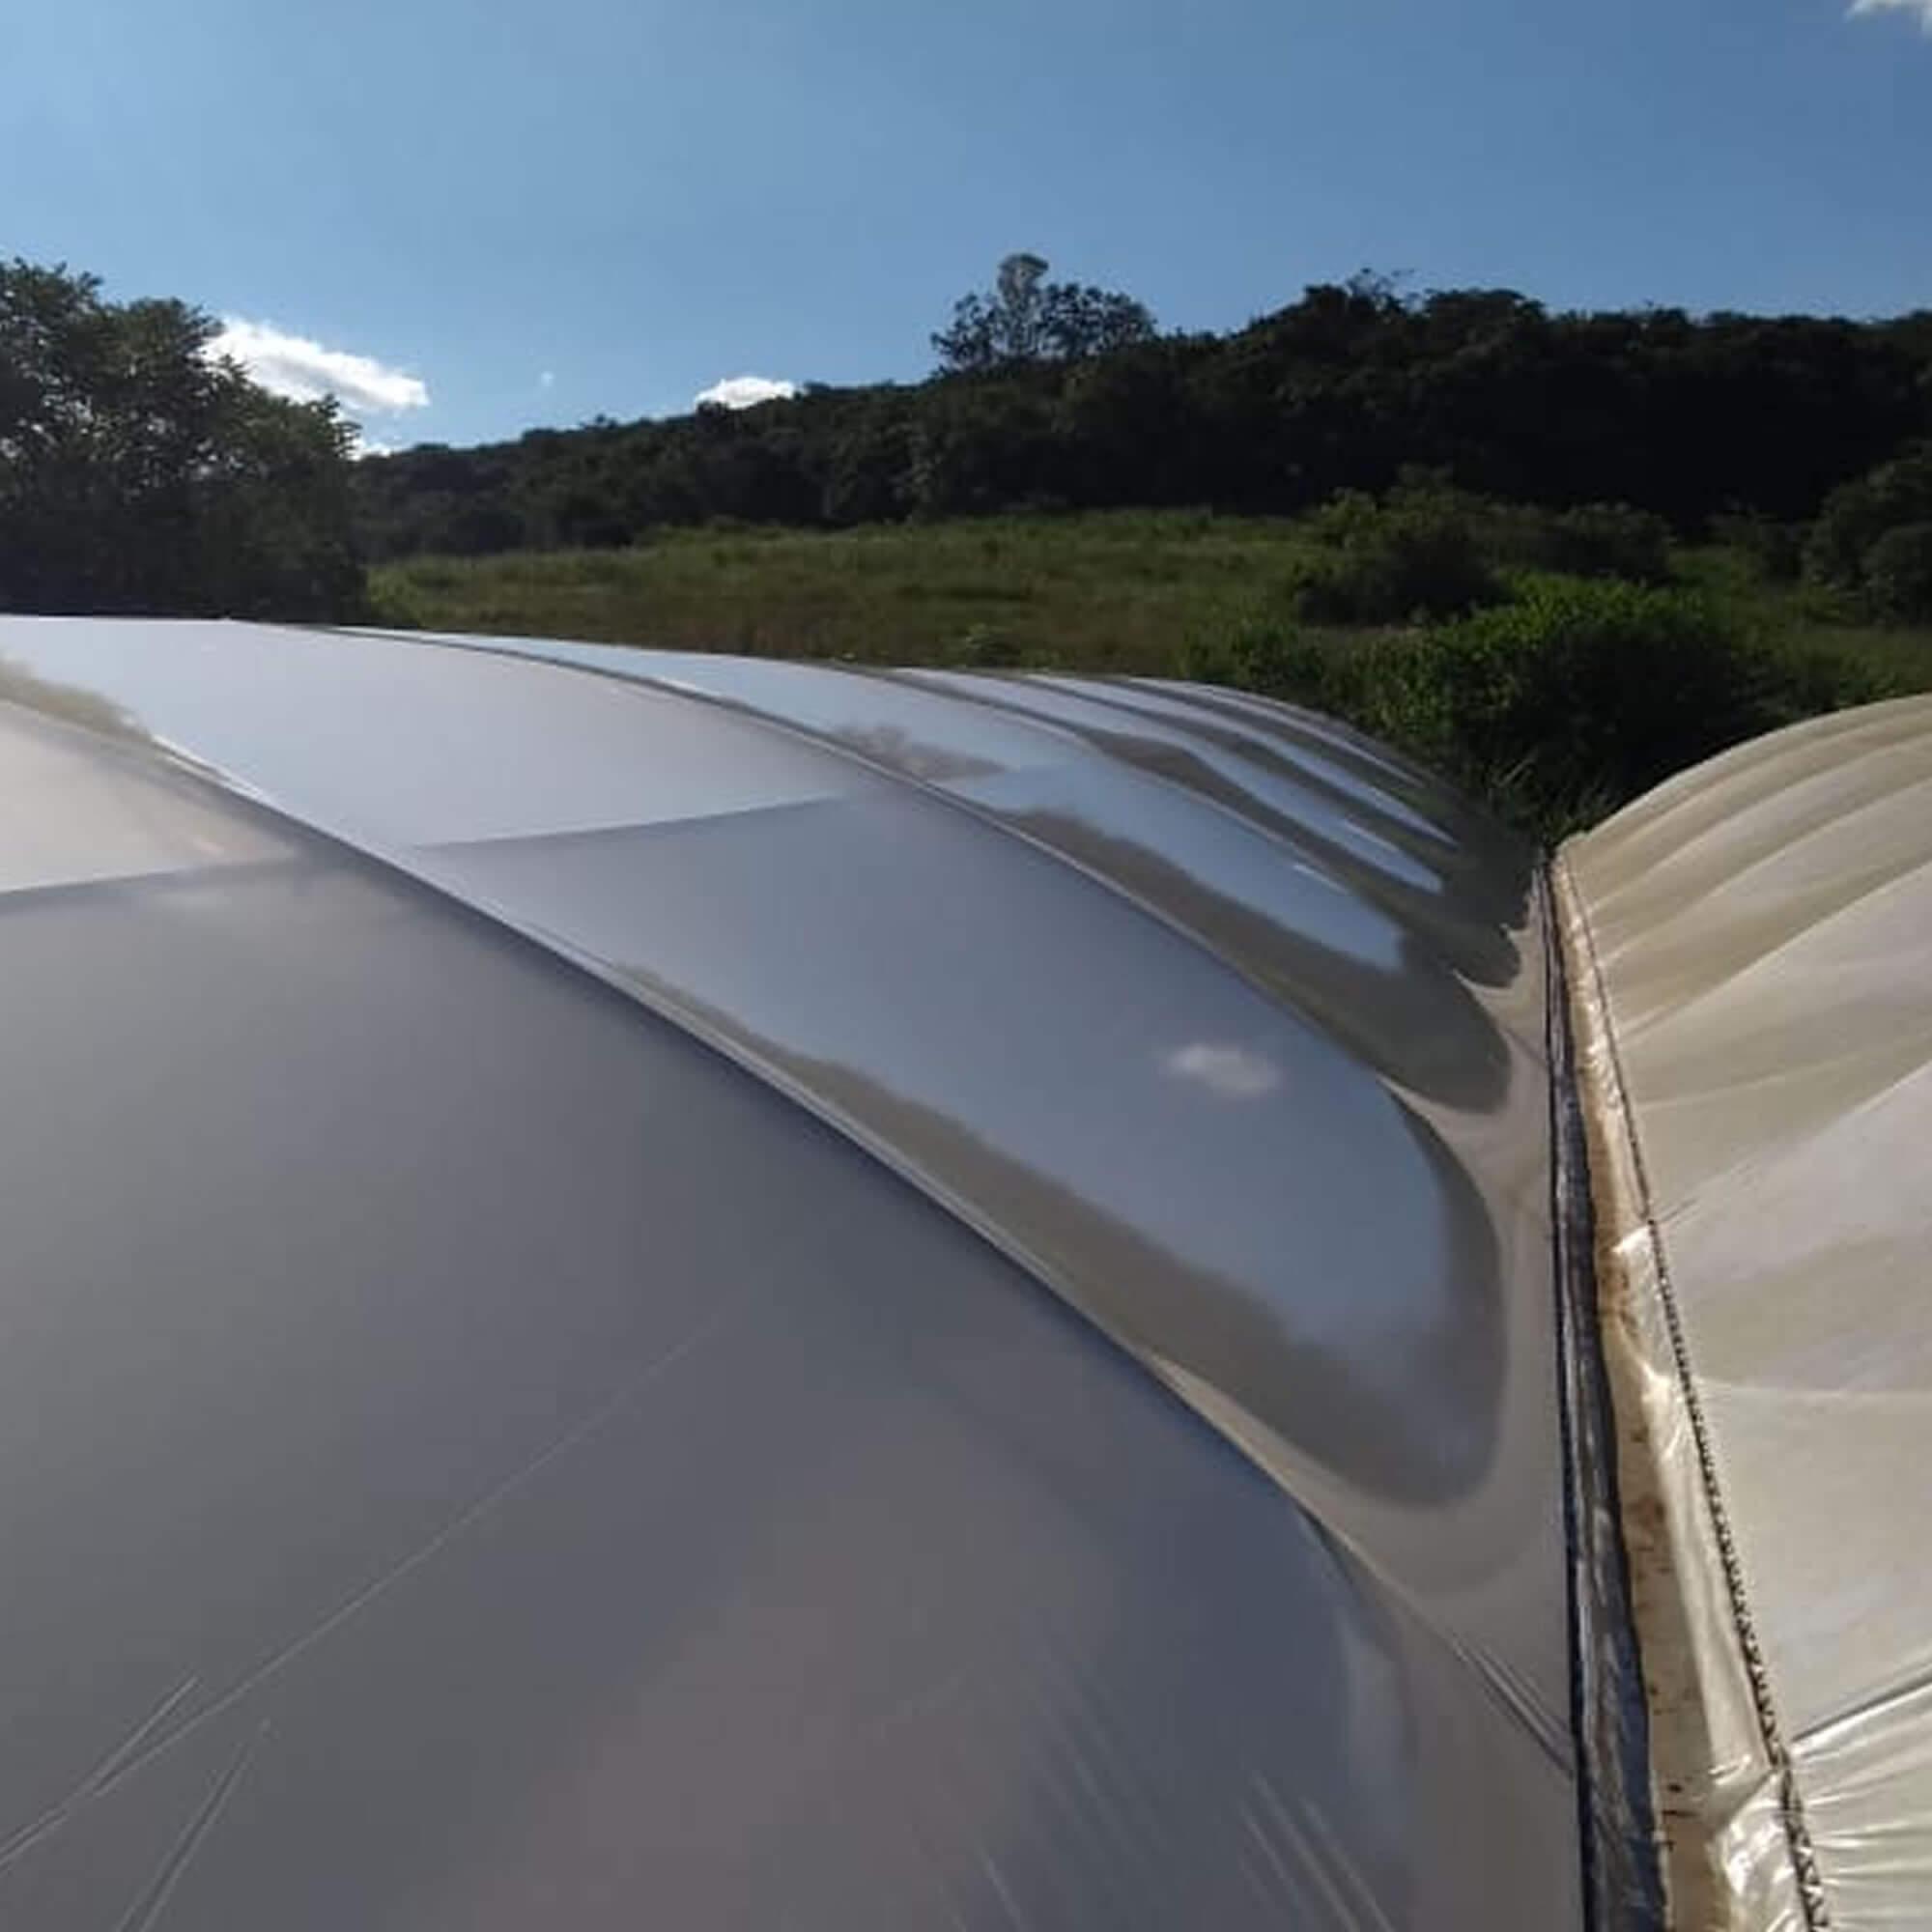 Filme Plástico Difusor para Estufa - 8x55 metros - 90 micras - Politiv